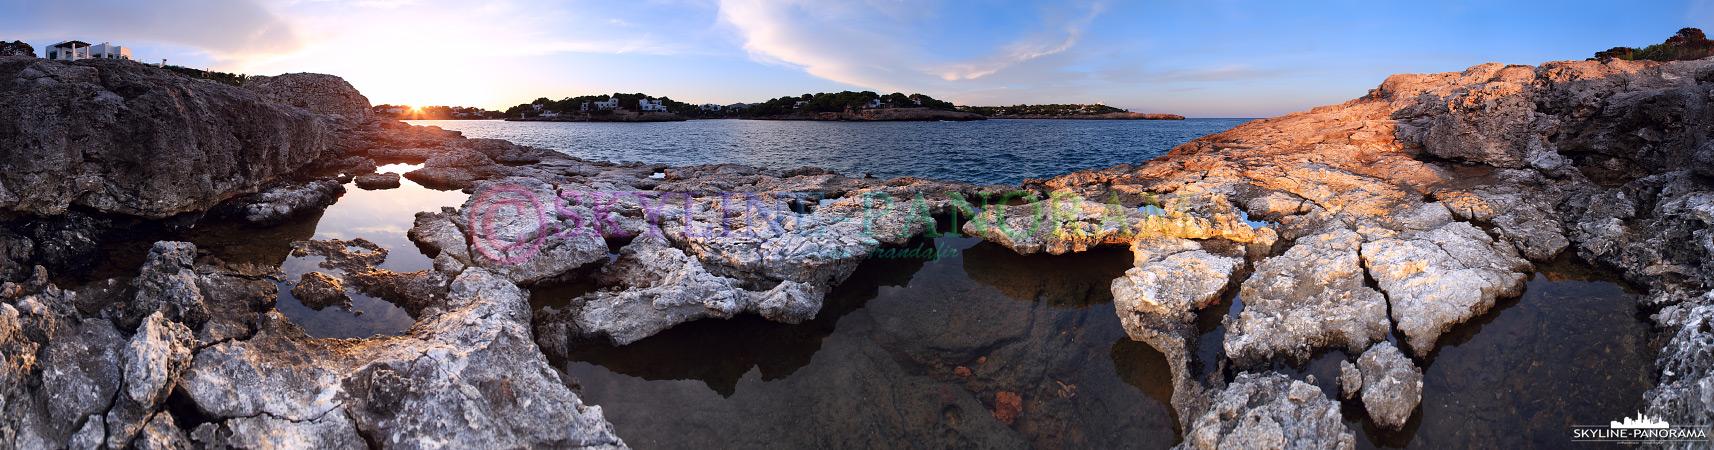 Panorama Mallorca - Bucht von Cala d´Or